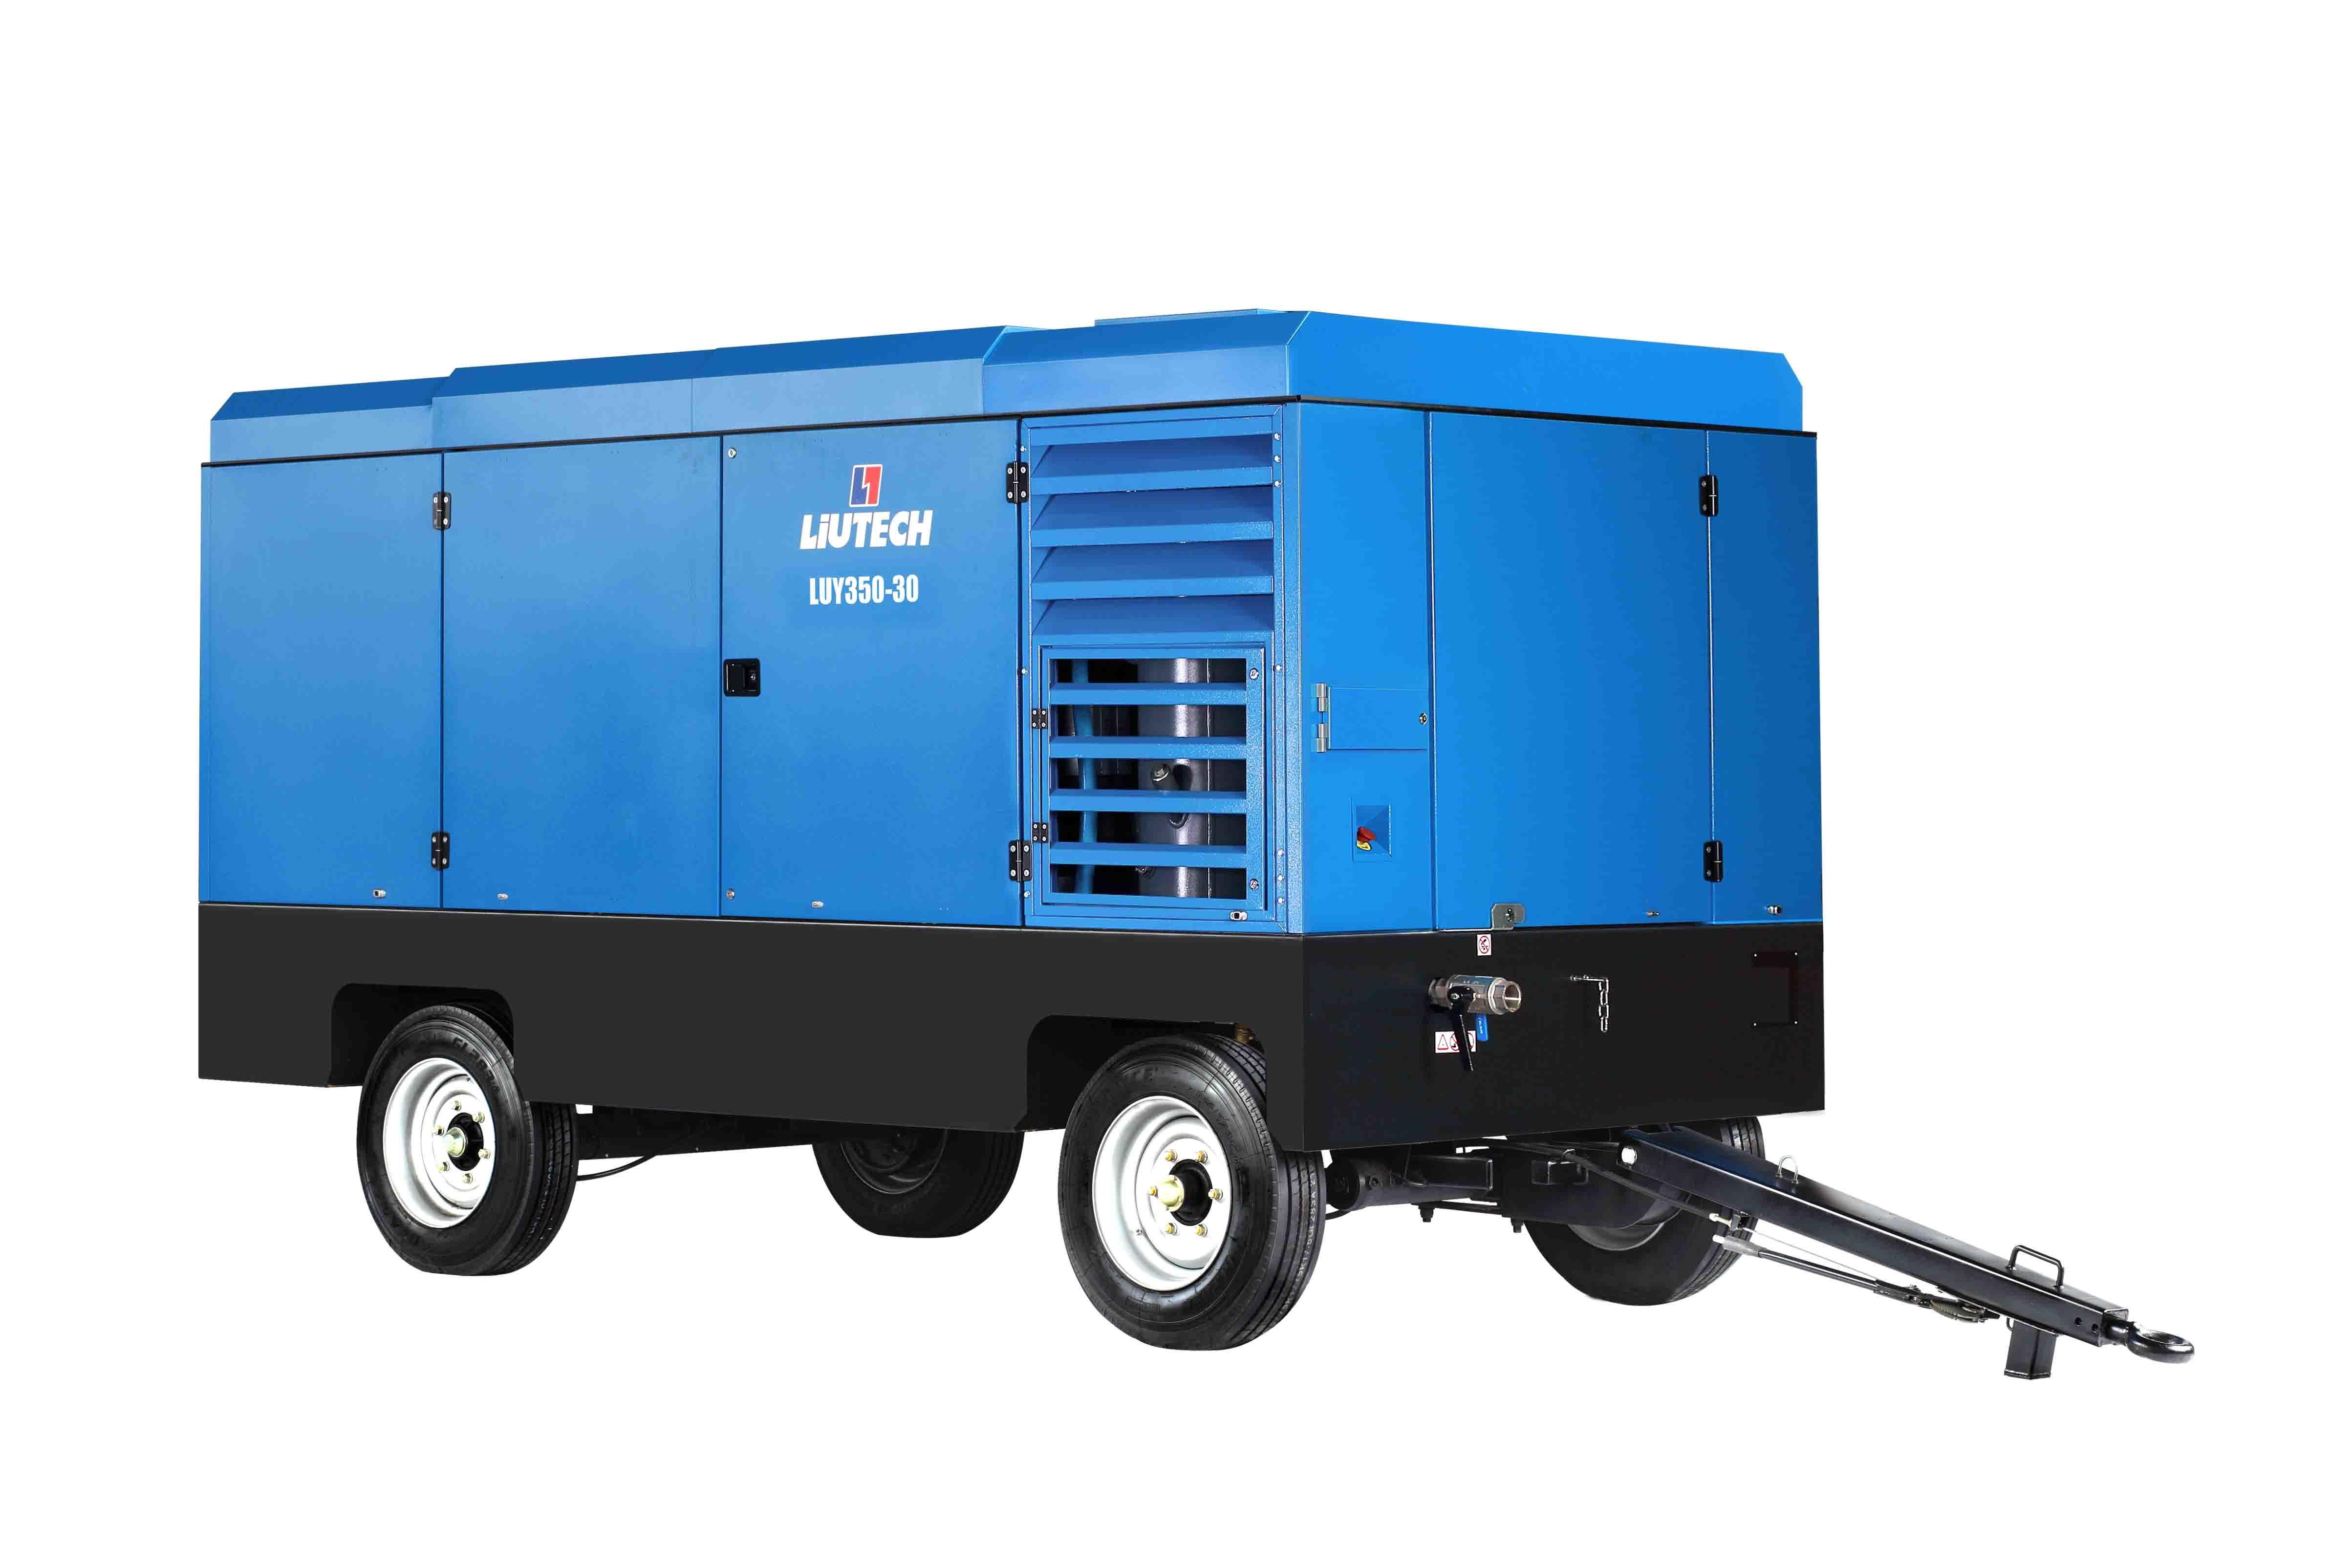 Atlas Copco Liutech 30bar High Pressure Portable Air Compressor